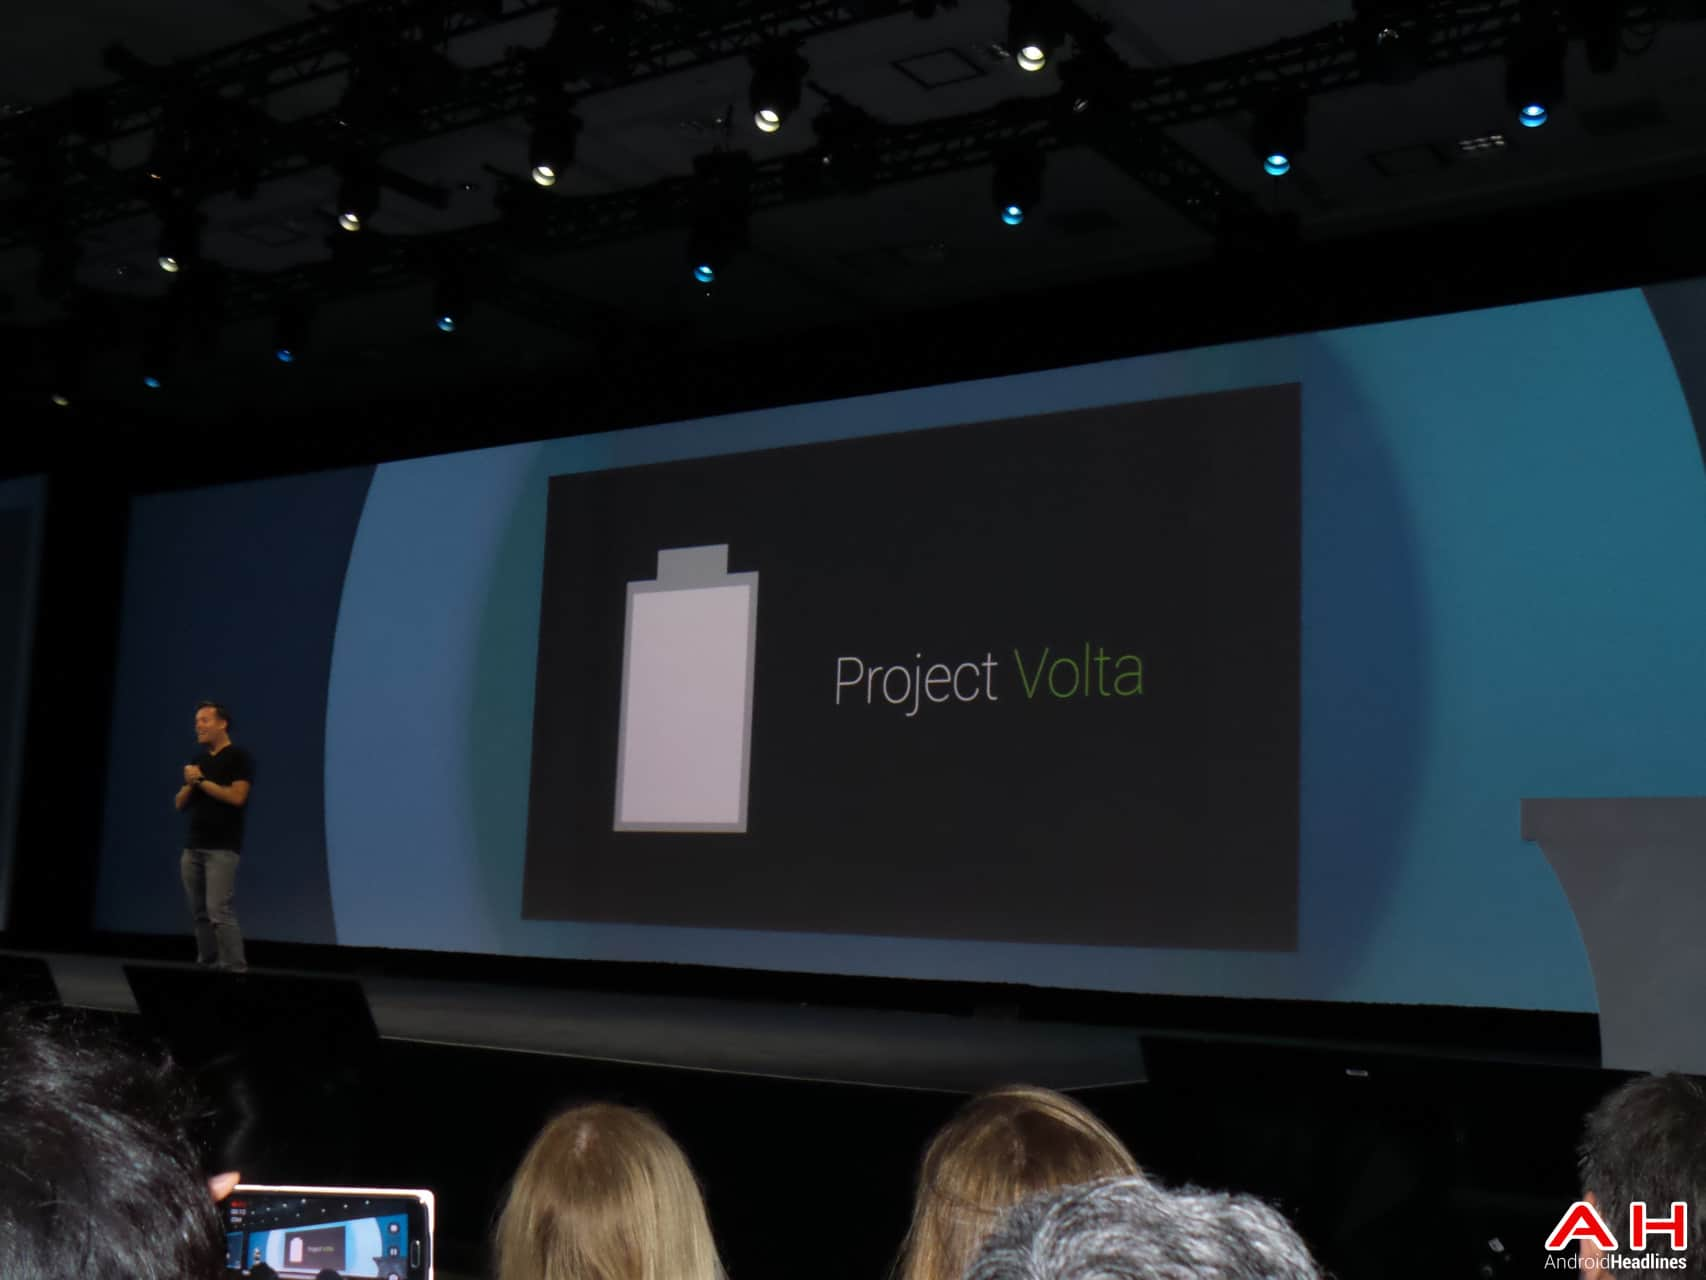 AH Google IO 2014 201 of 5 Ptoject Volta